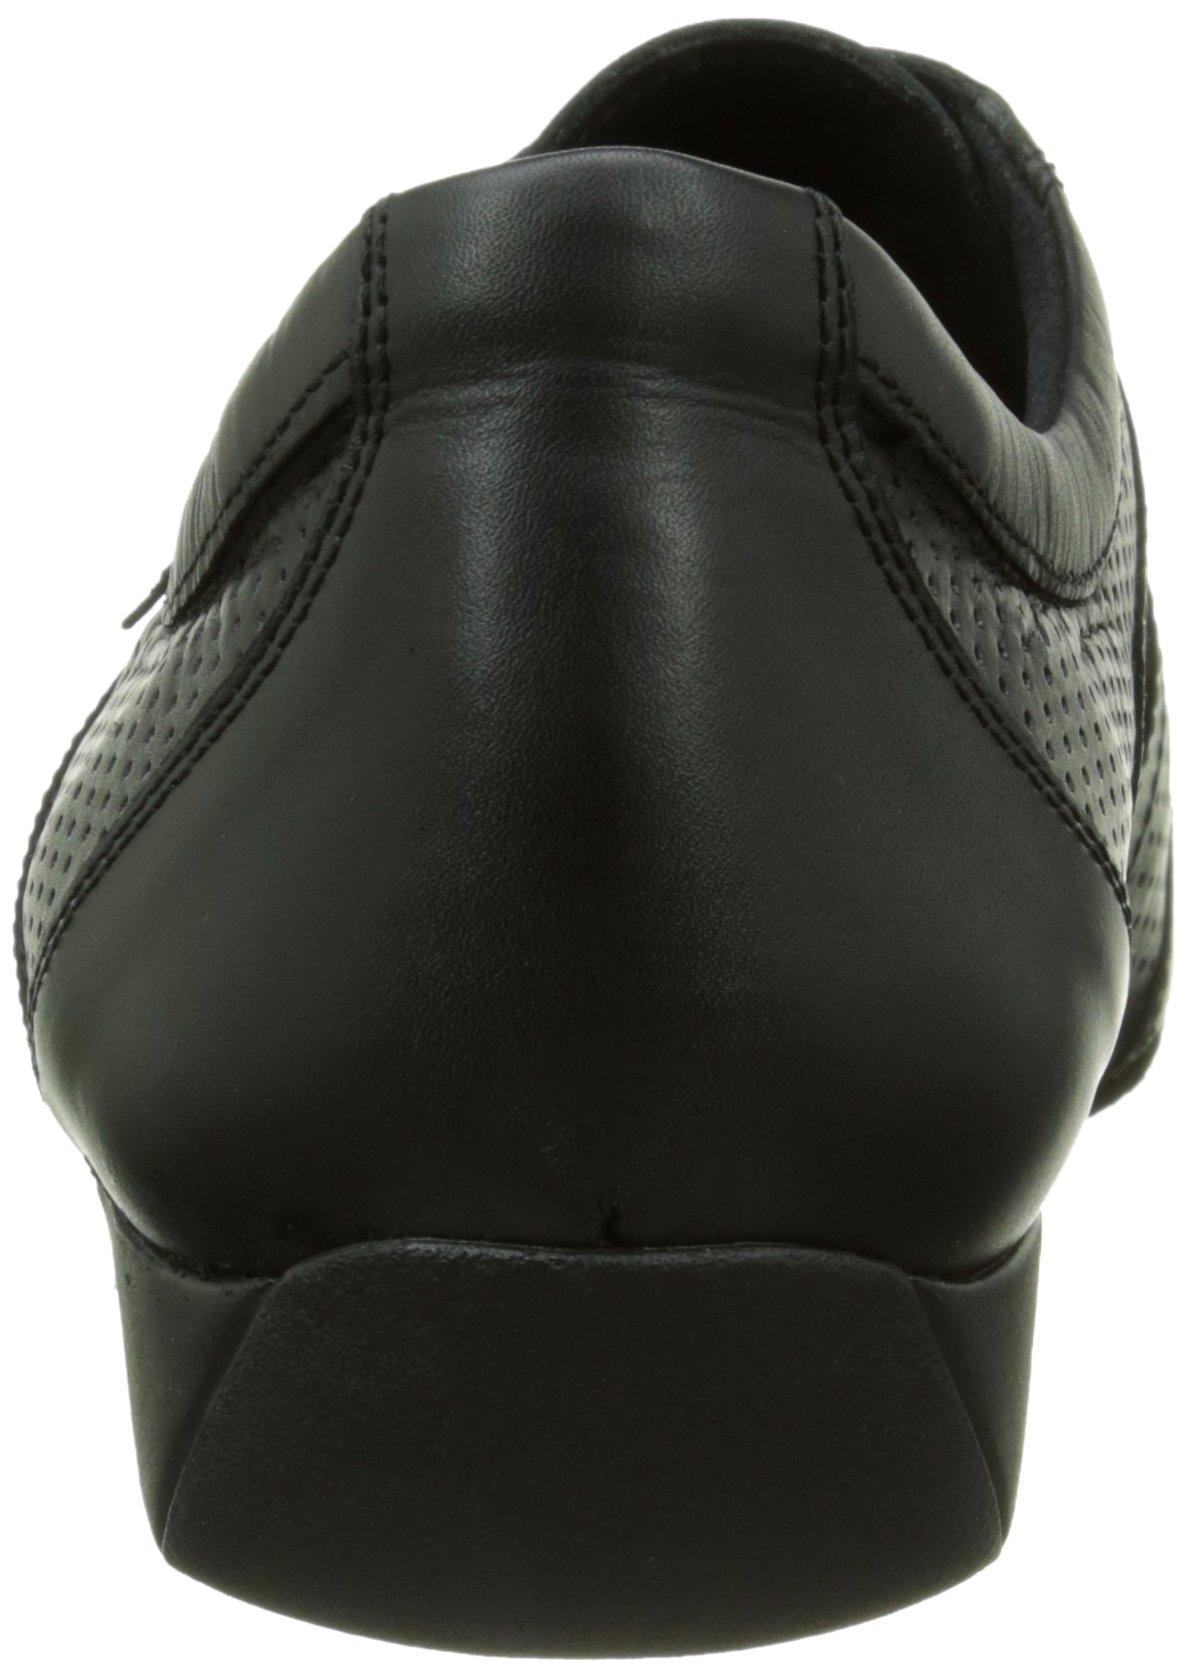 Diamant Men's Model 13 Dance Sneaker- 1'' (2.5 cm) Wedge Heel (Wide - H Width), 13.5 W US (13 UK) by Diamant (Image #2)